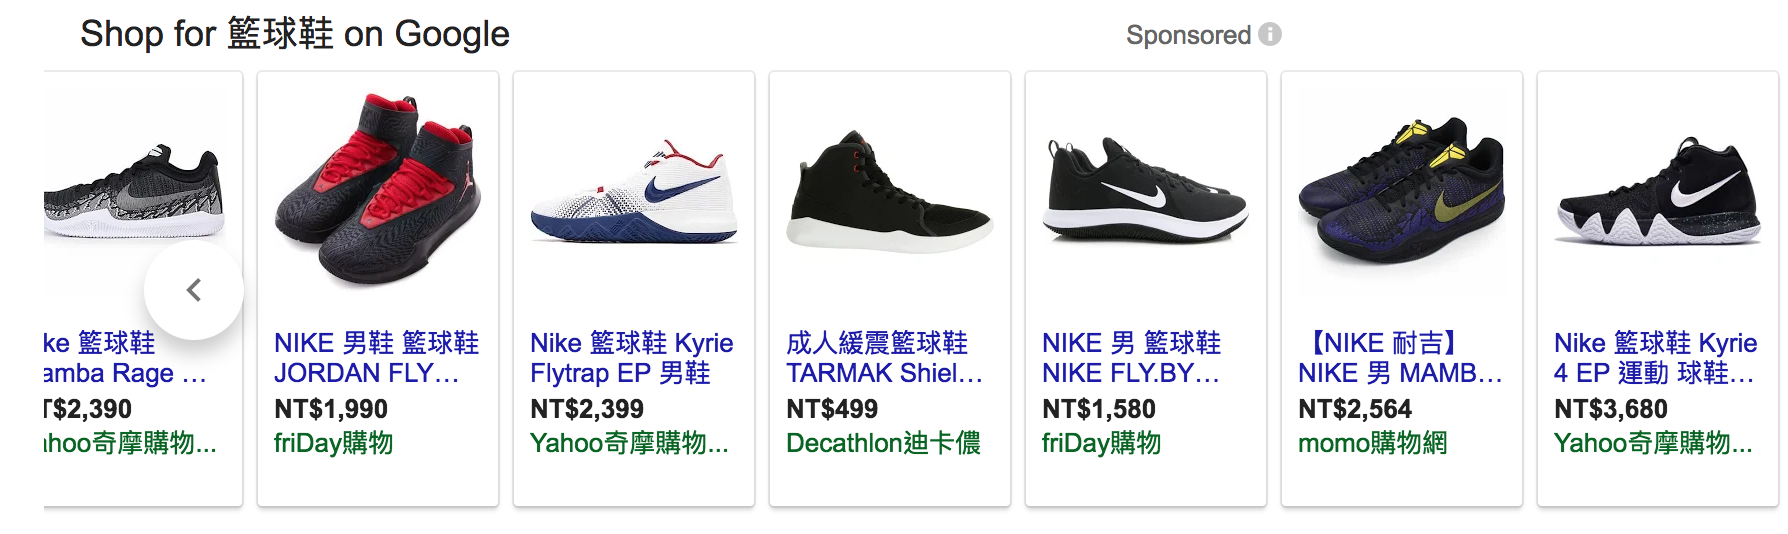 seo-品牌行銷的幫助-藍球鞋